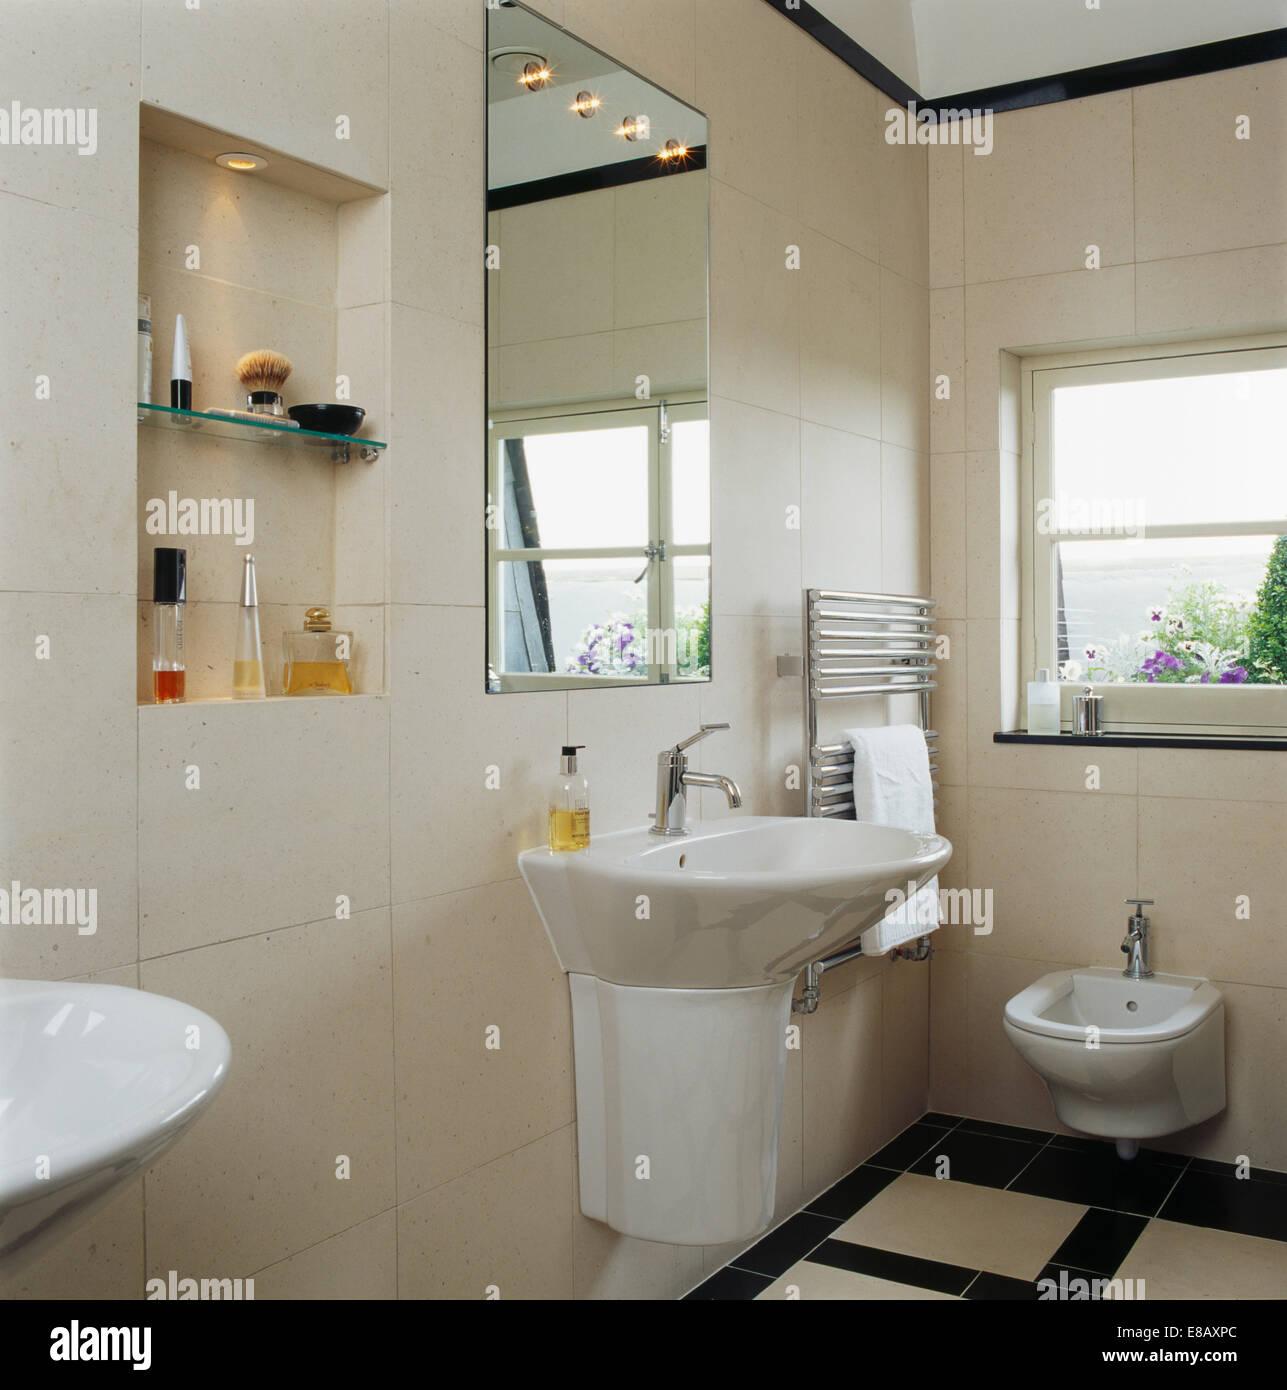 Mirror above wall mounted basin in modern tiled bathroom for Bathroom alcove shelves